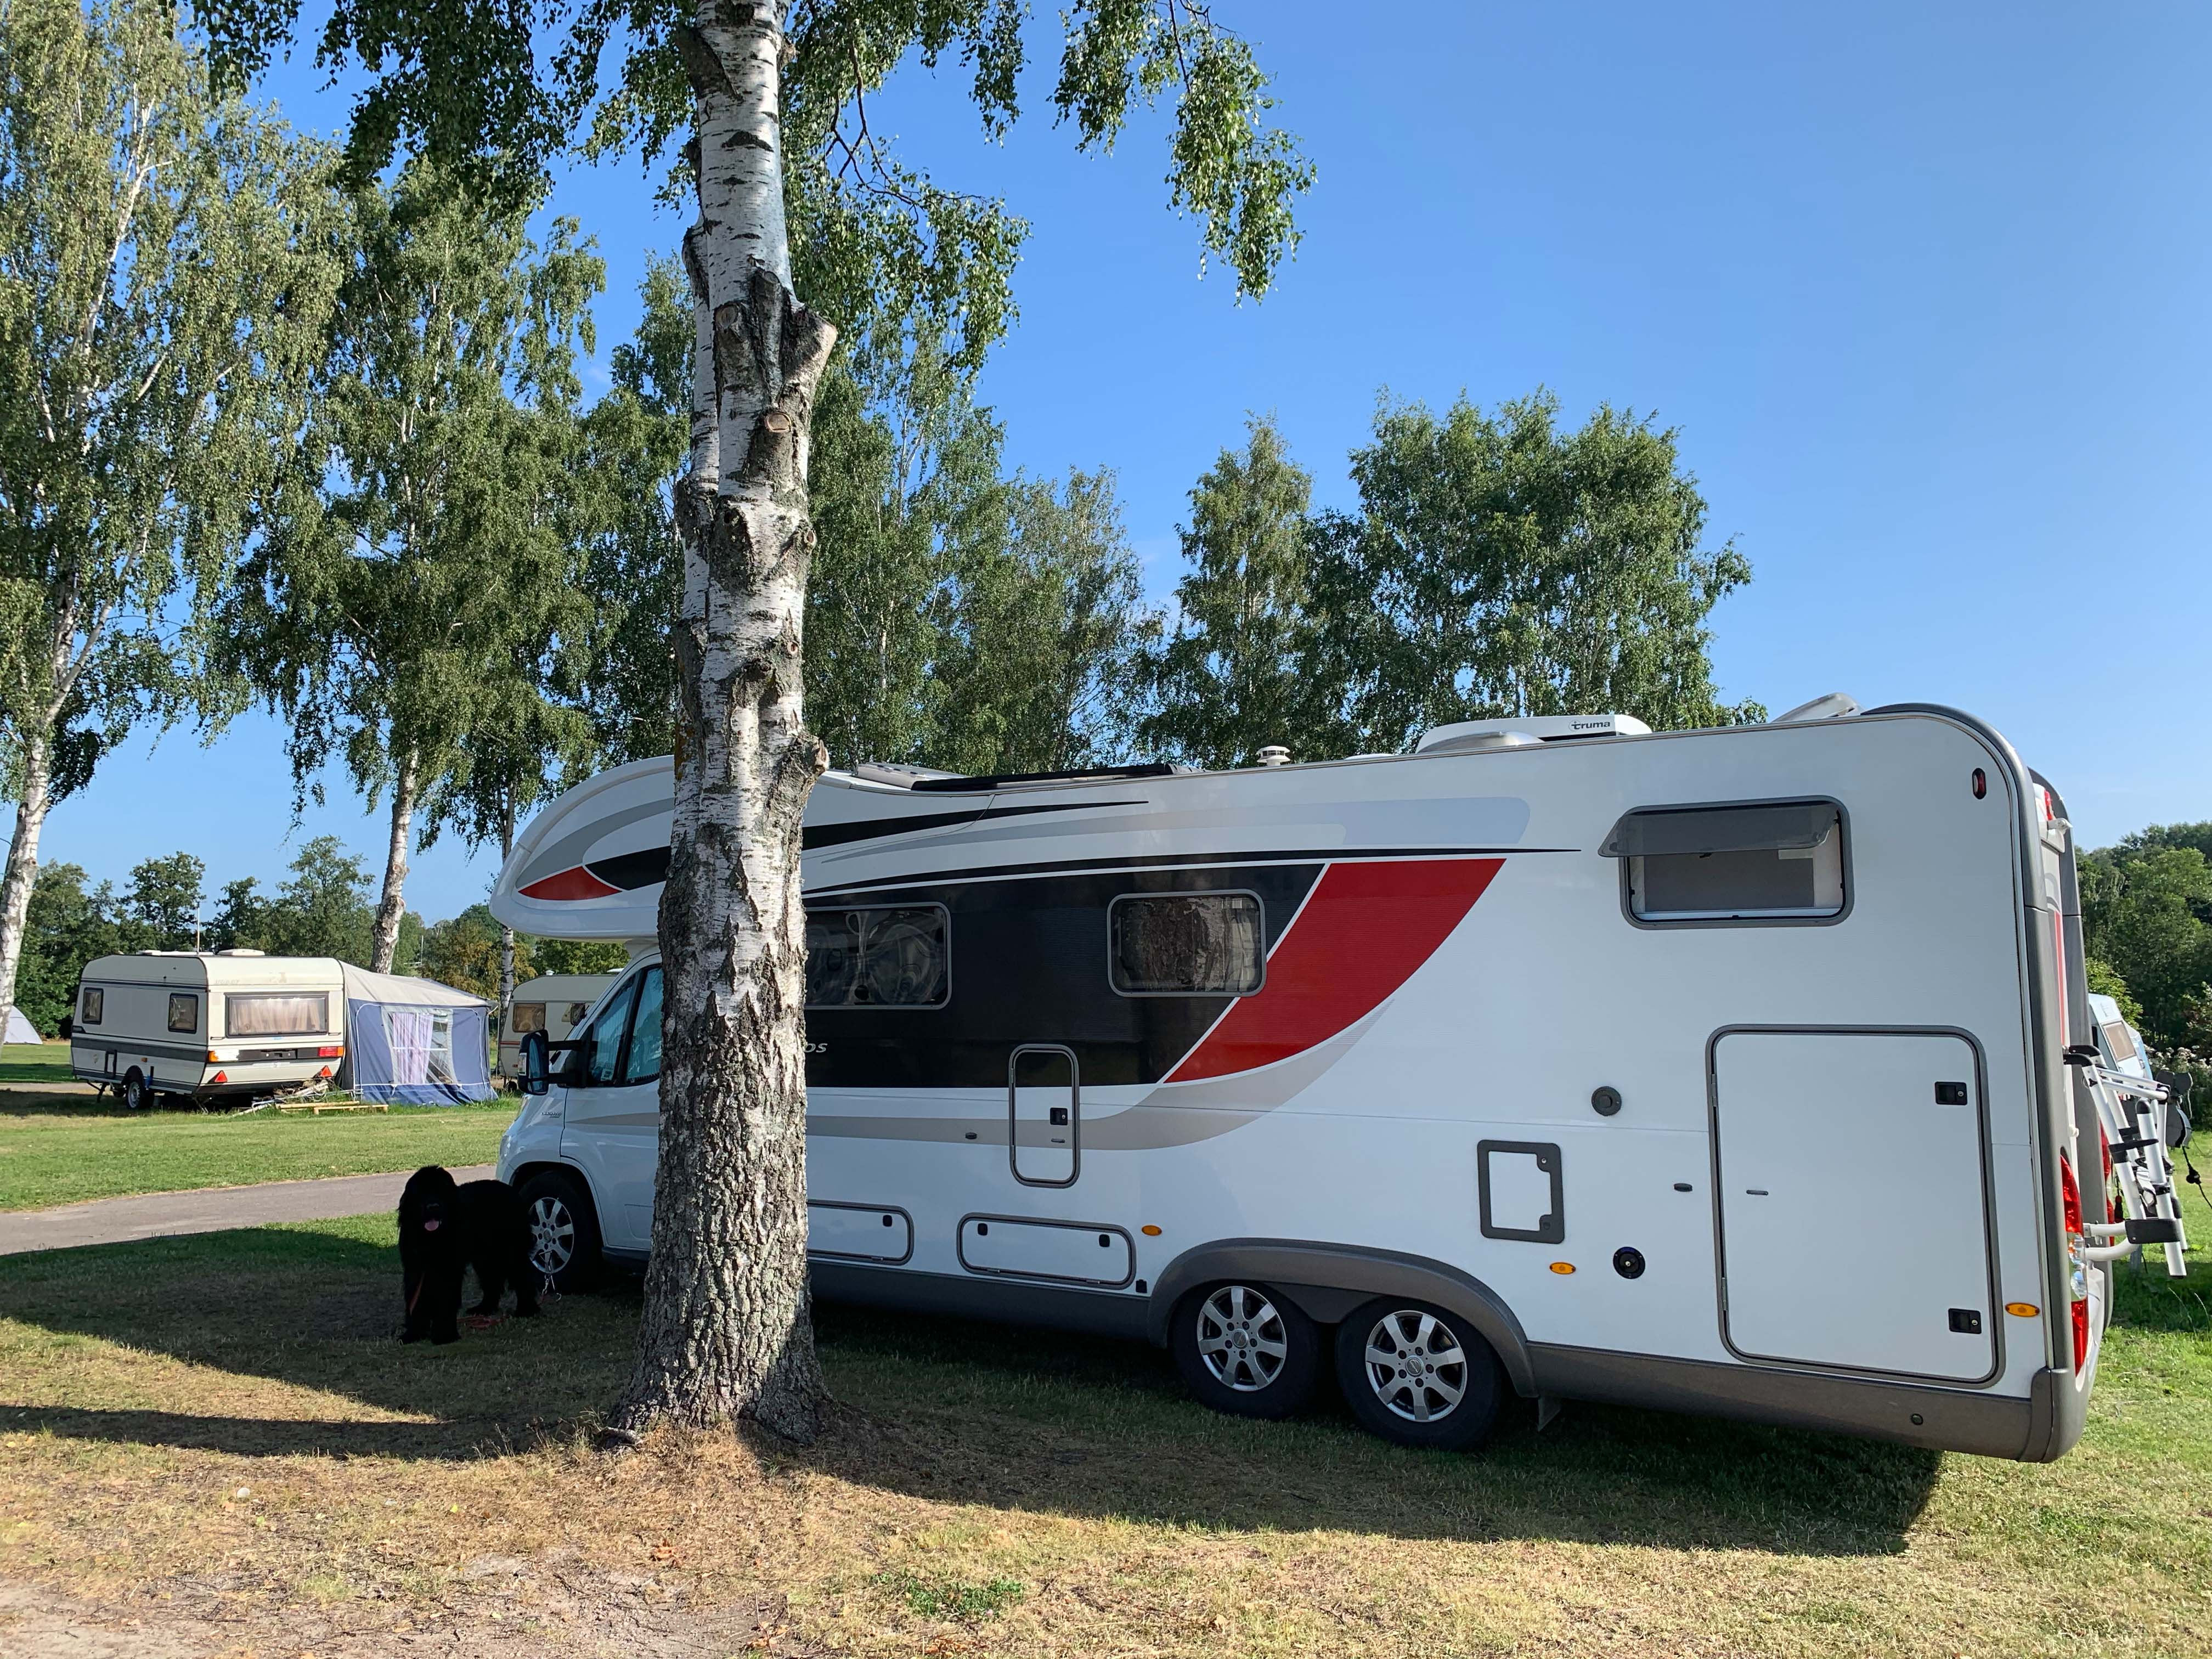 Norrköping_Camping02